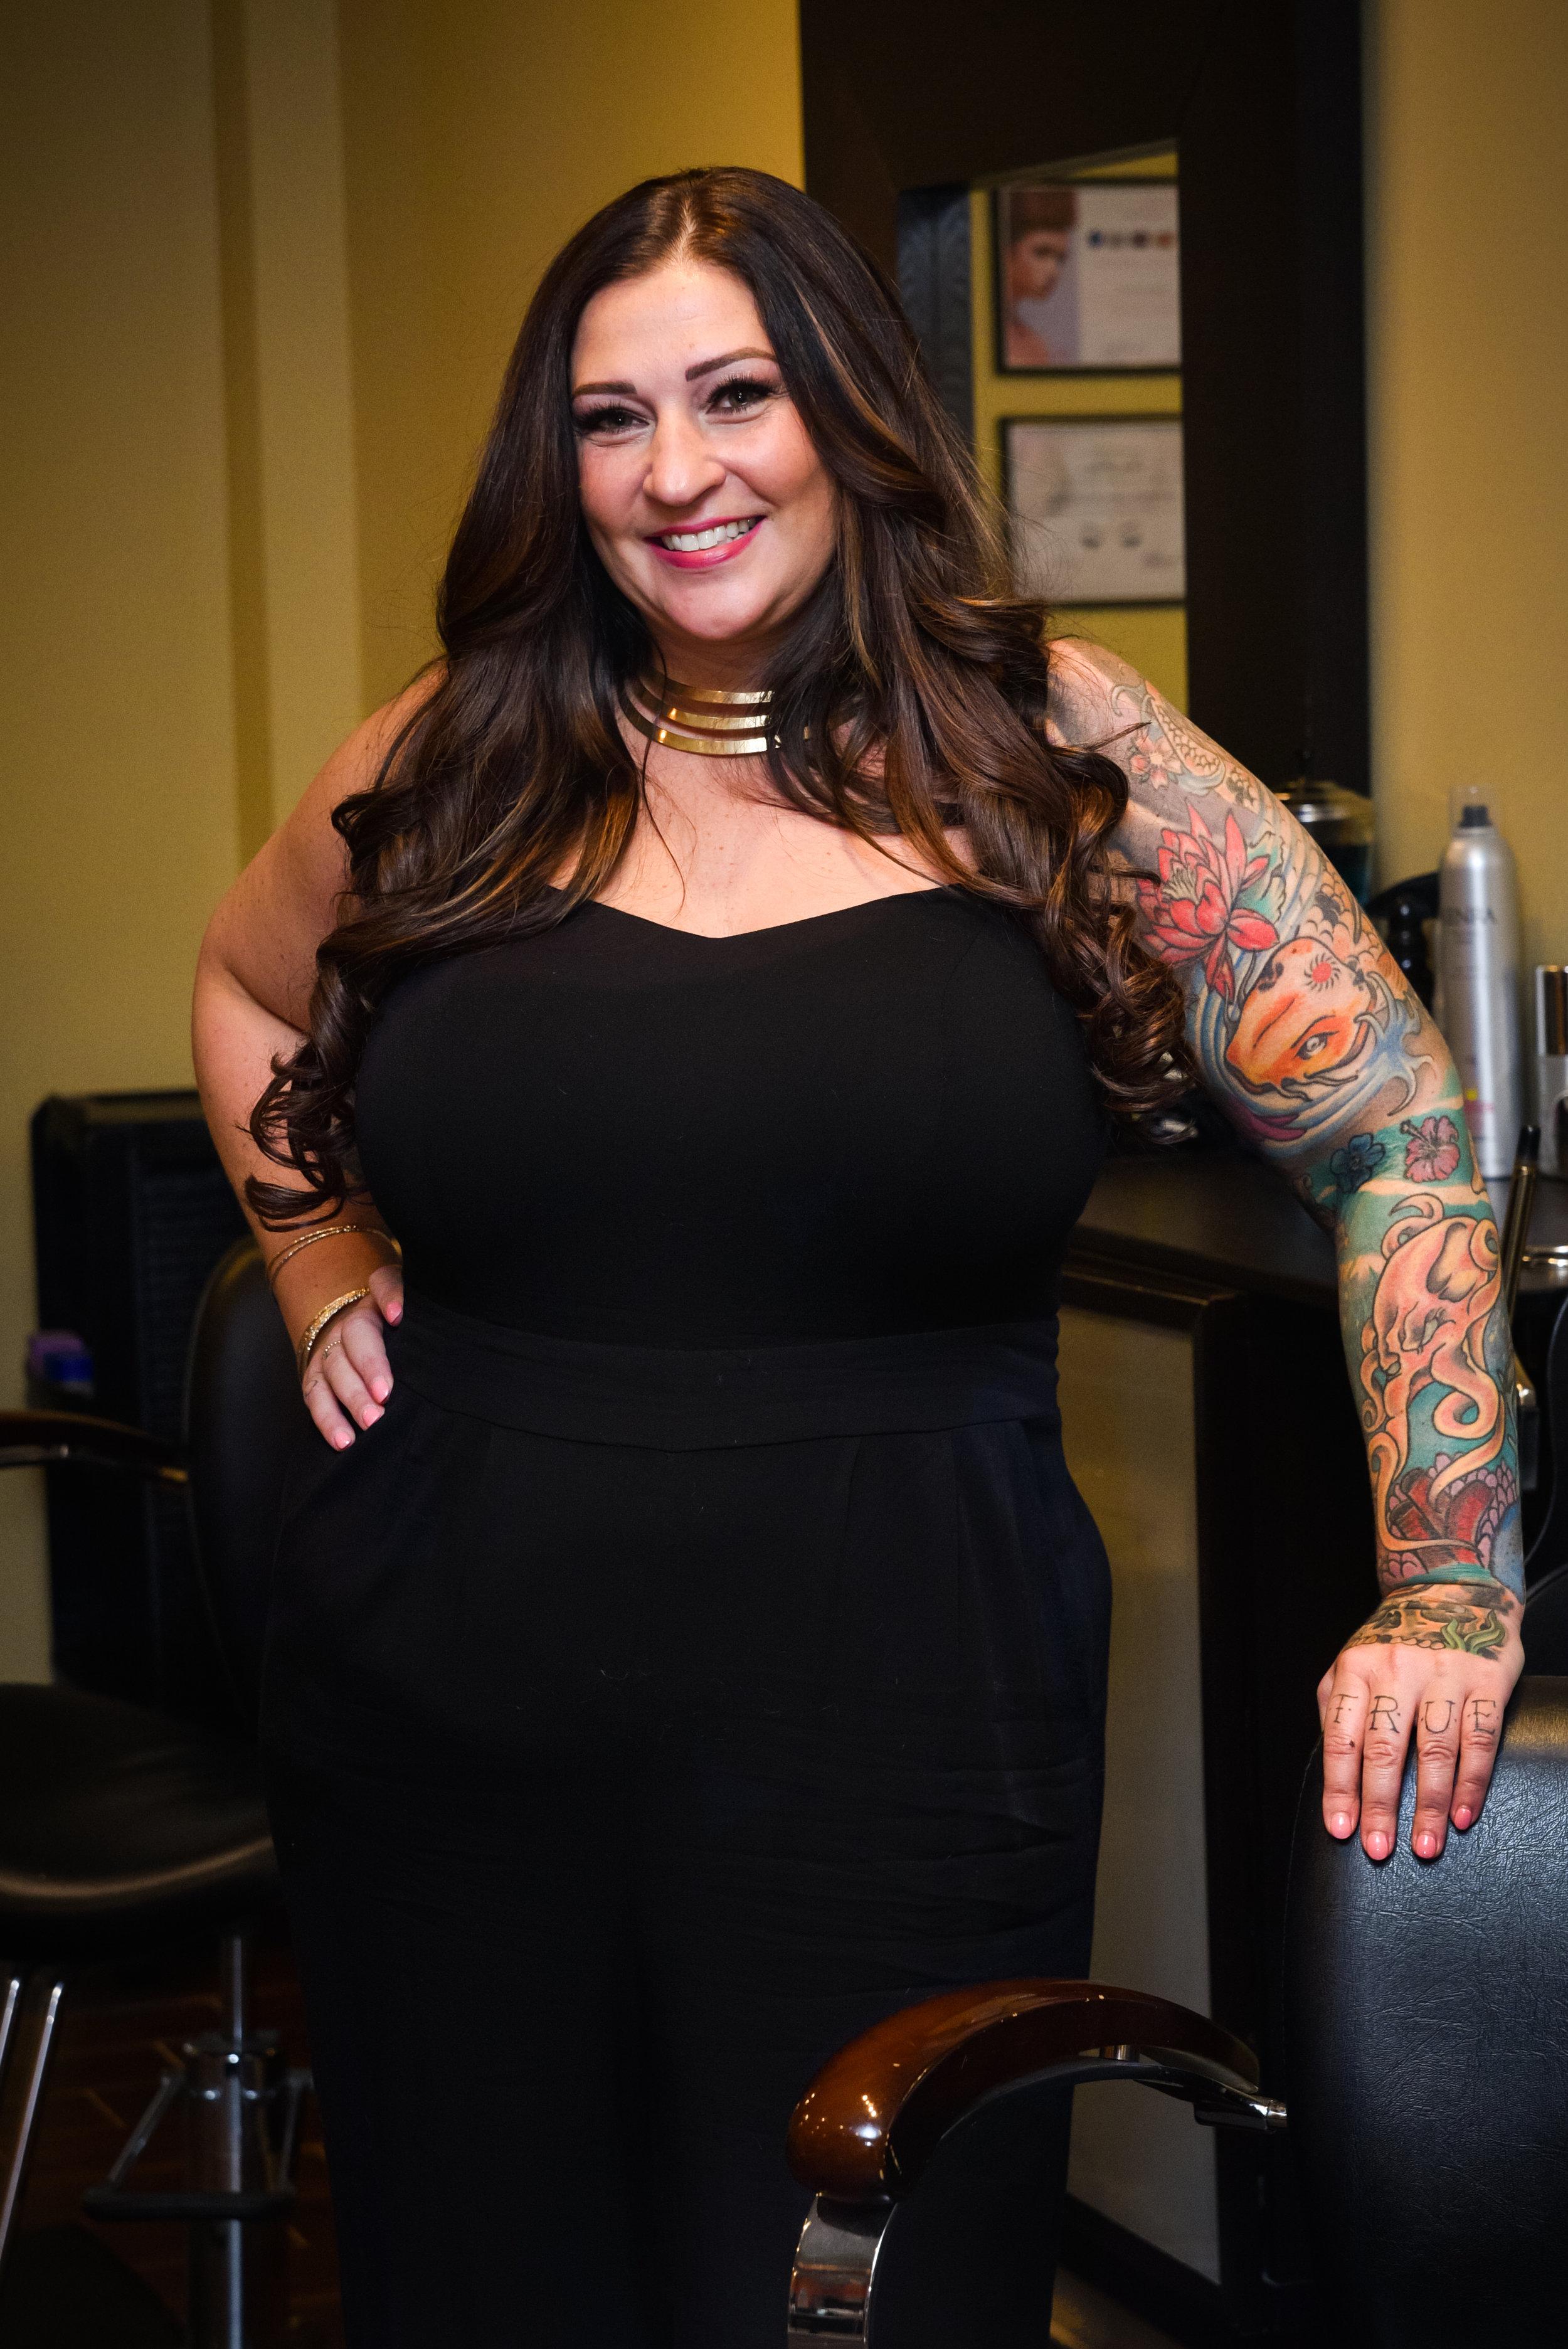 Victoria Snider - Stylist / Make Up Artist / Microblading Specialist